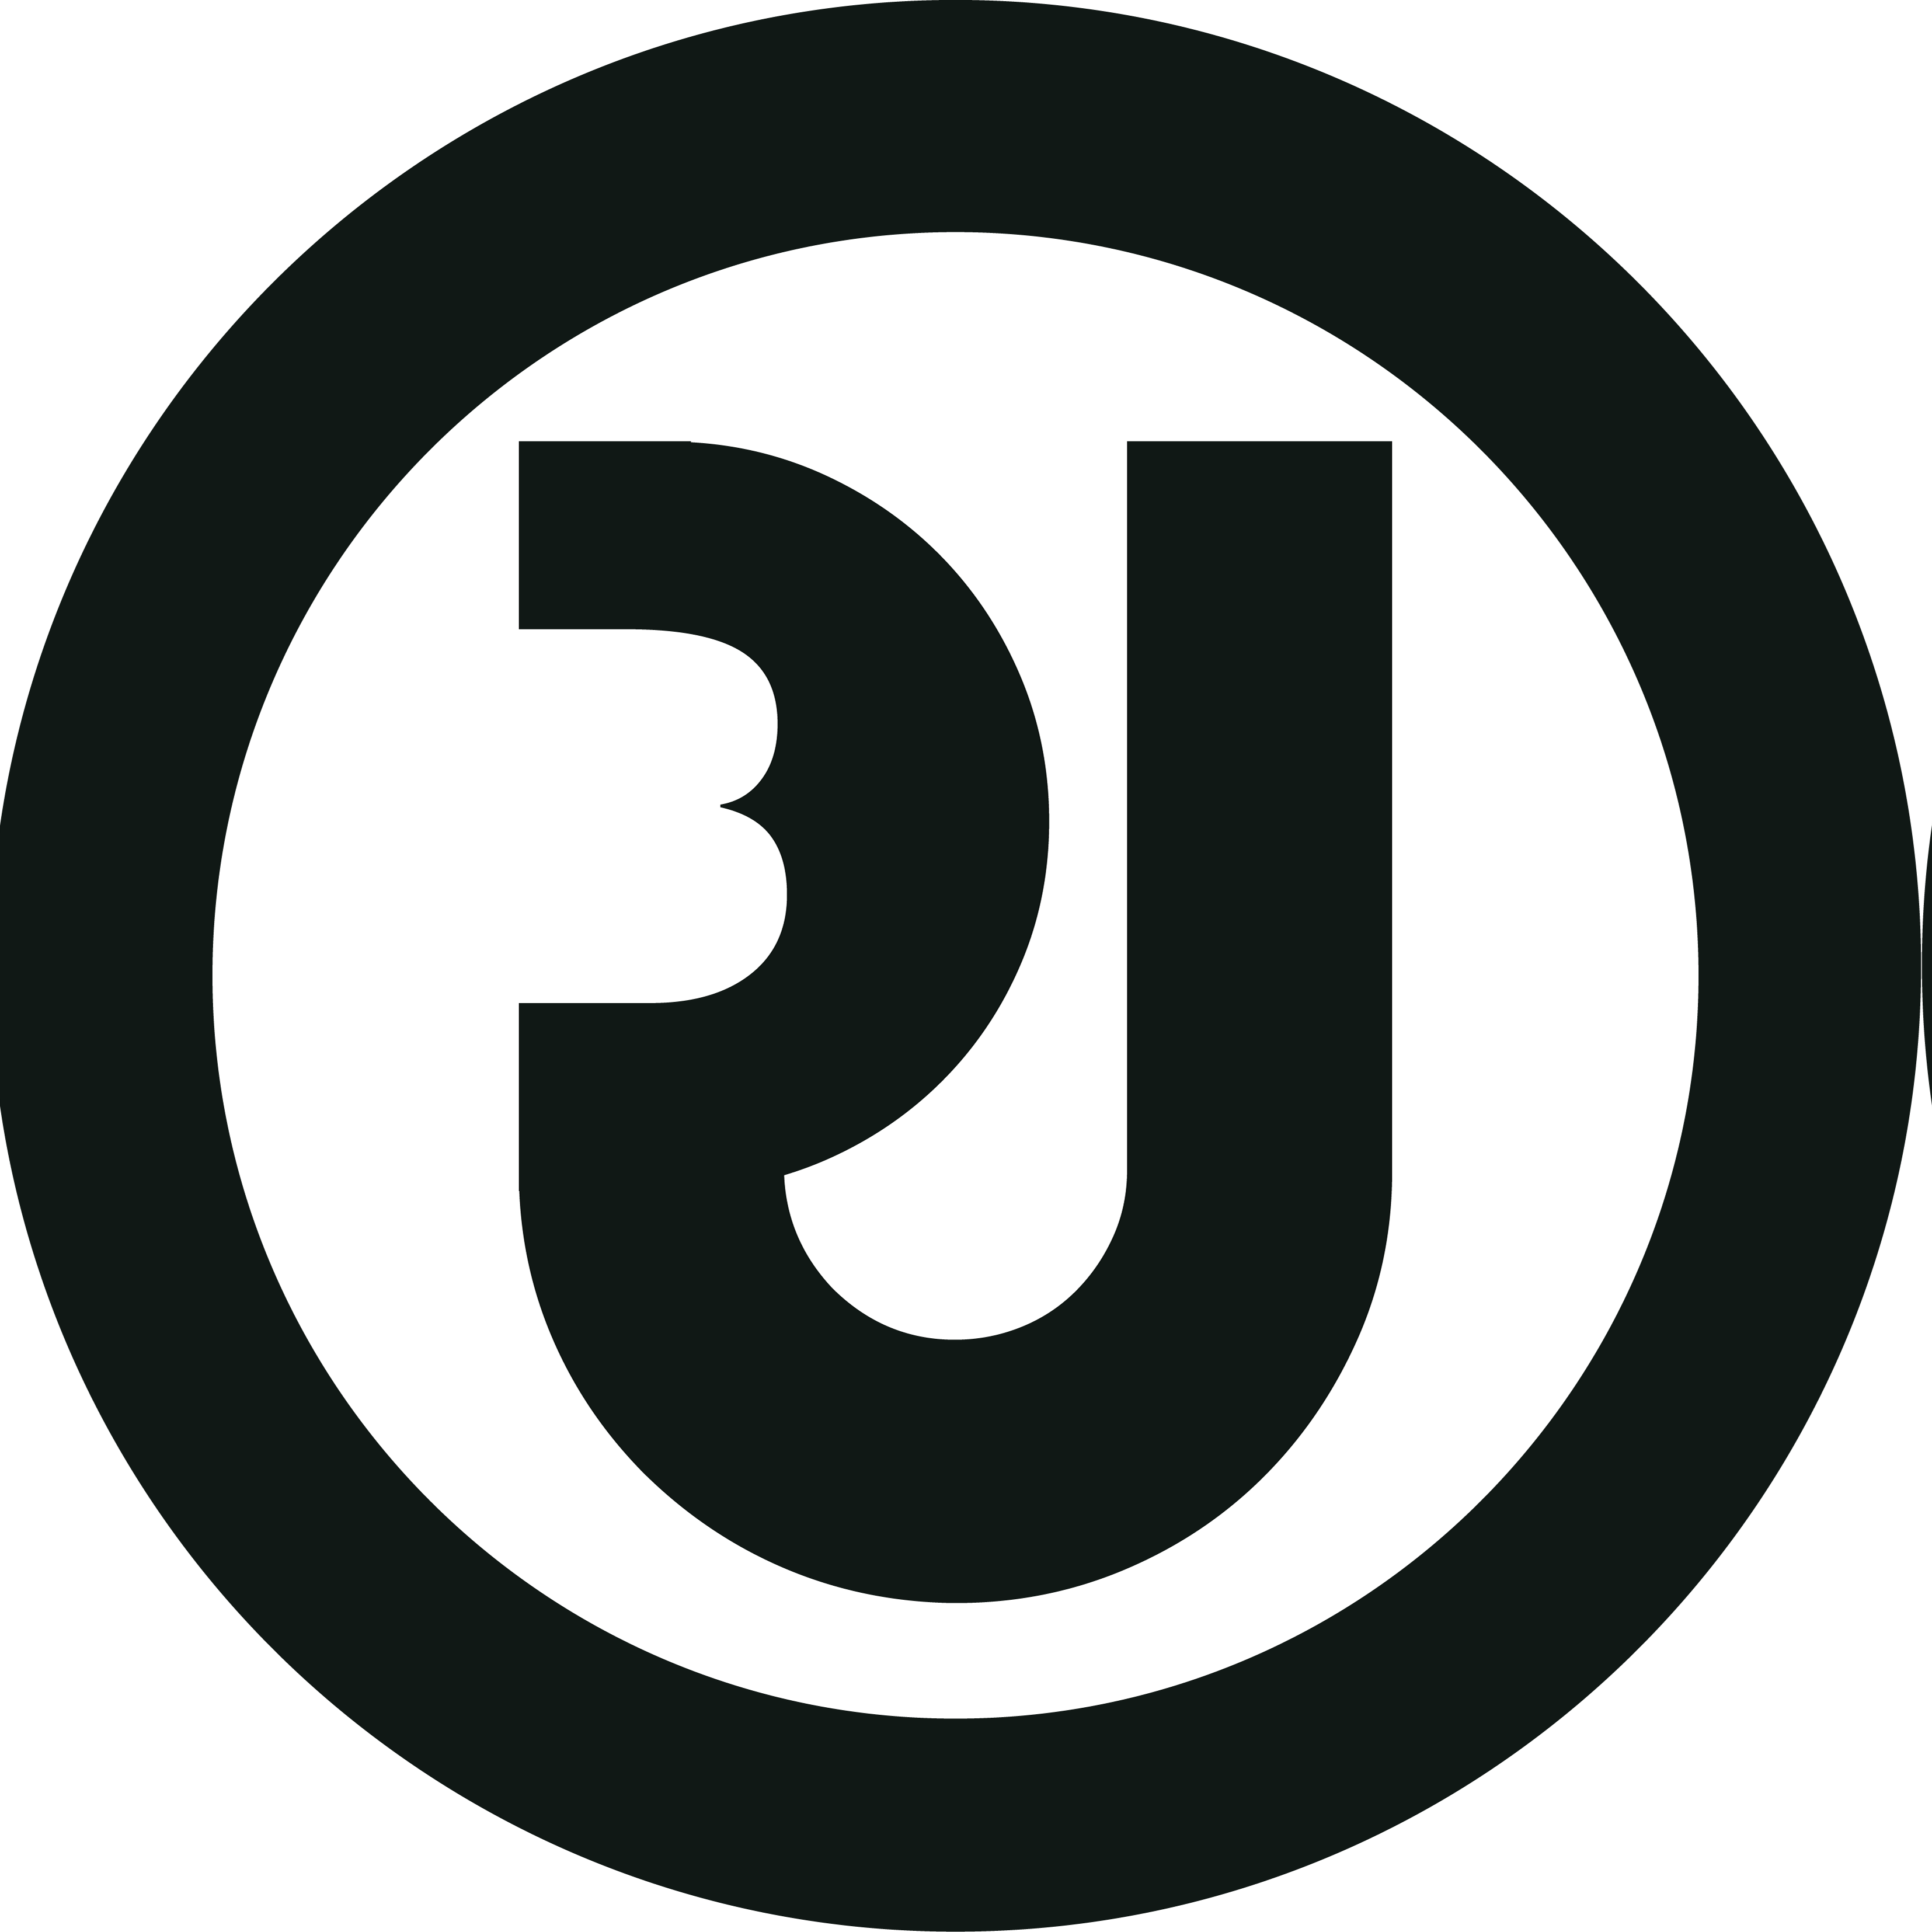 designs by j.